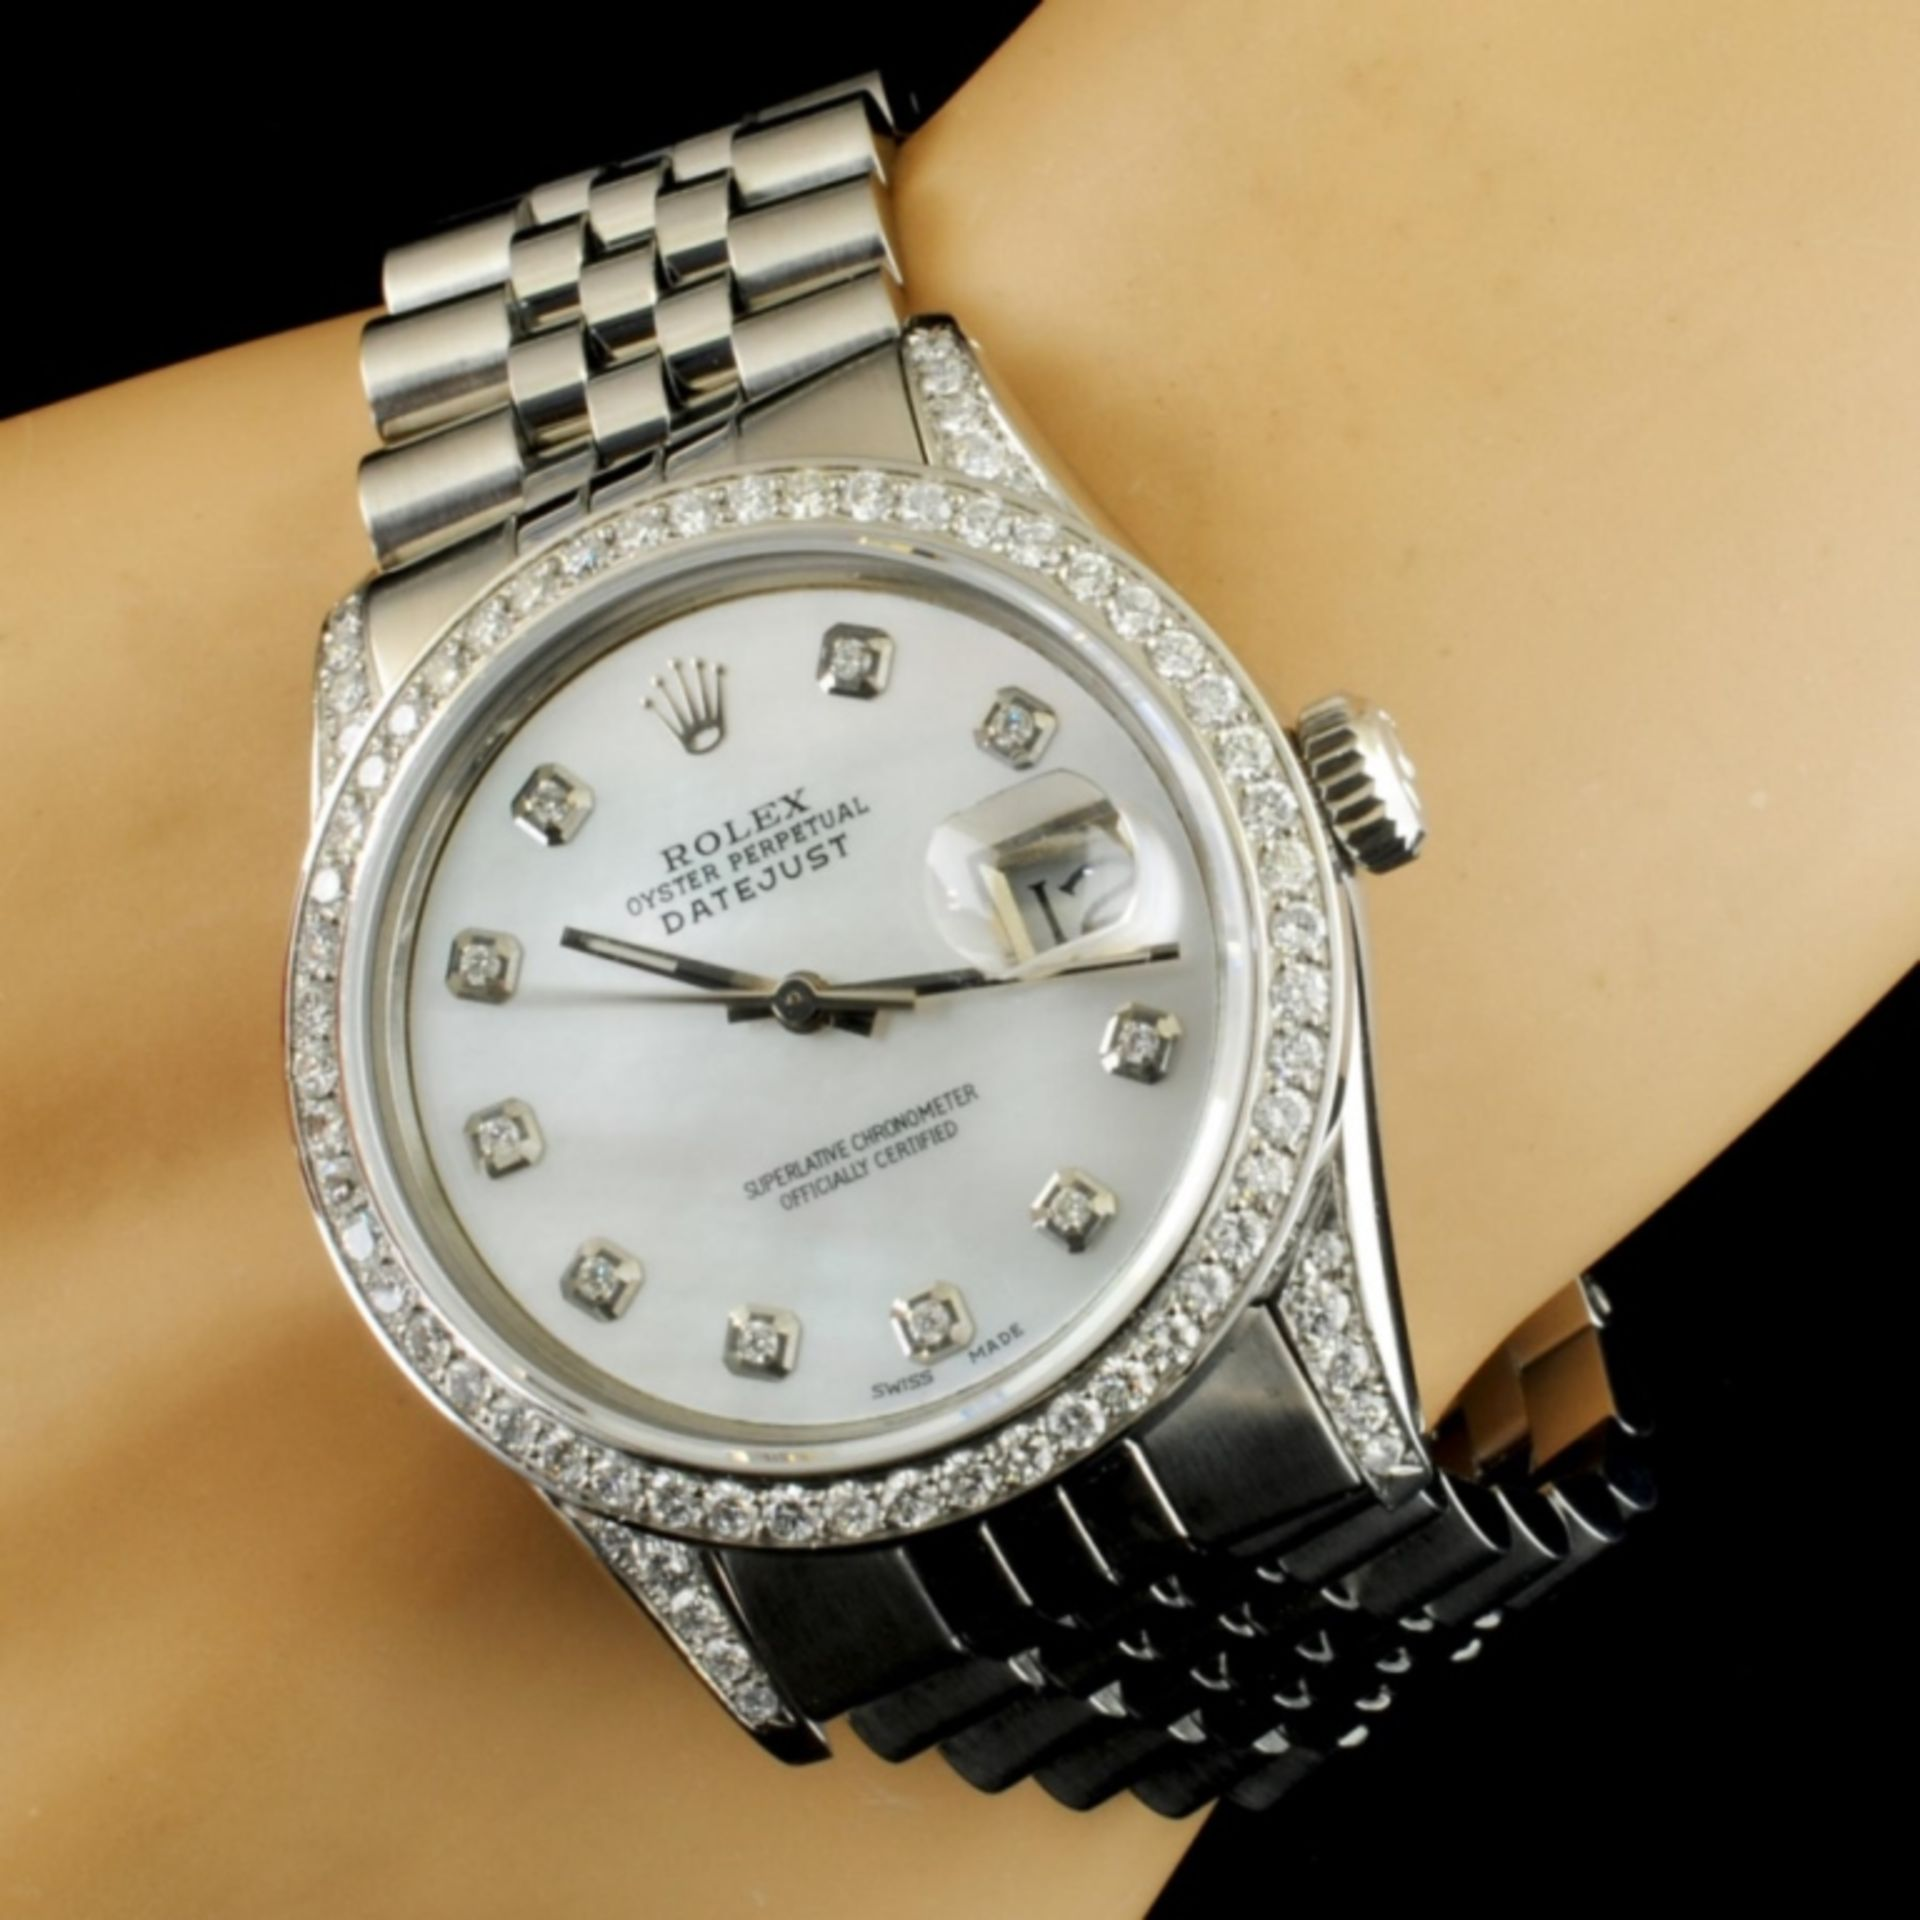 Rolex DateJust 1.50ctw Diamond 36MM Wristwatch - Image 2 of 6